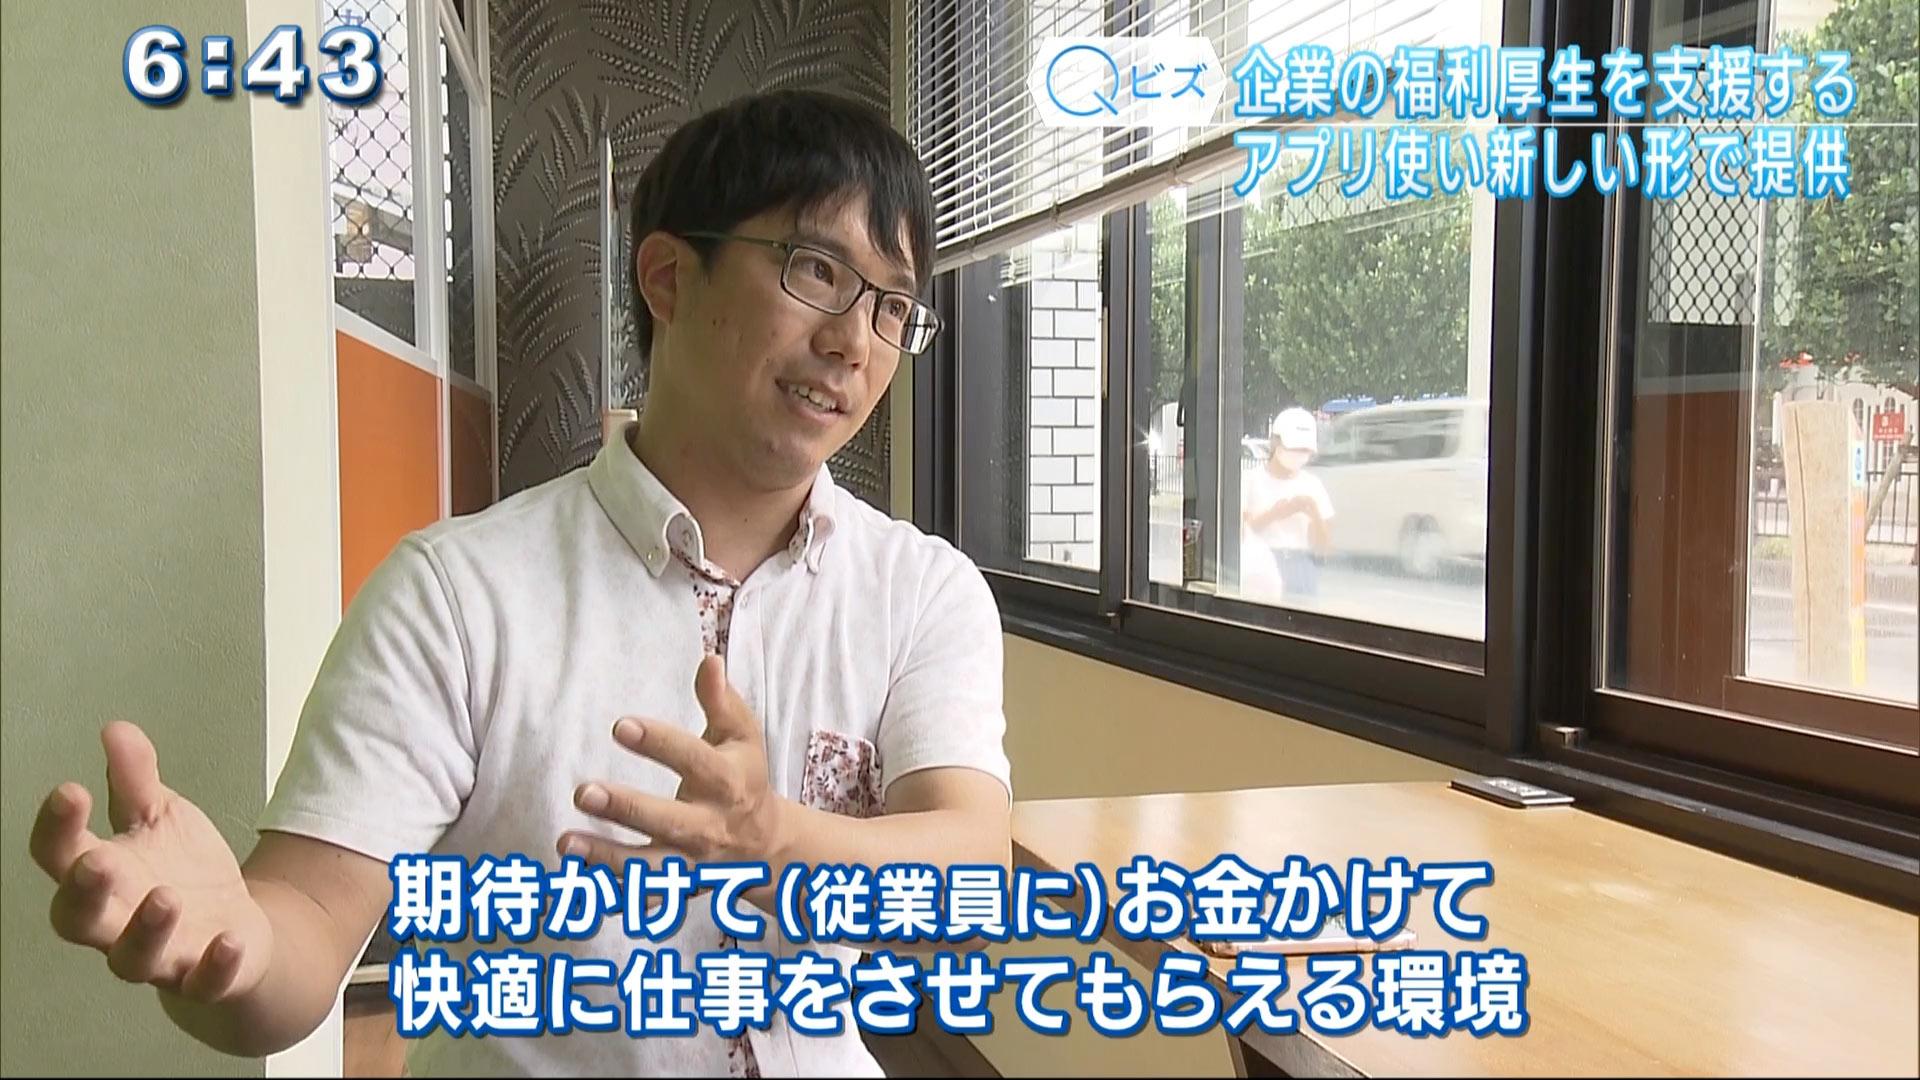 Qビズ「カロリパークス~沖縄初の福利厚生アプリ!?~